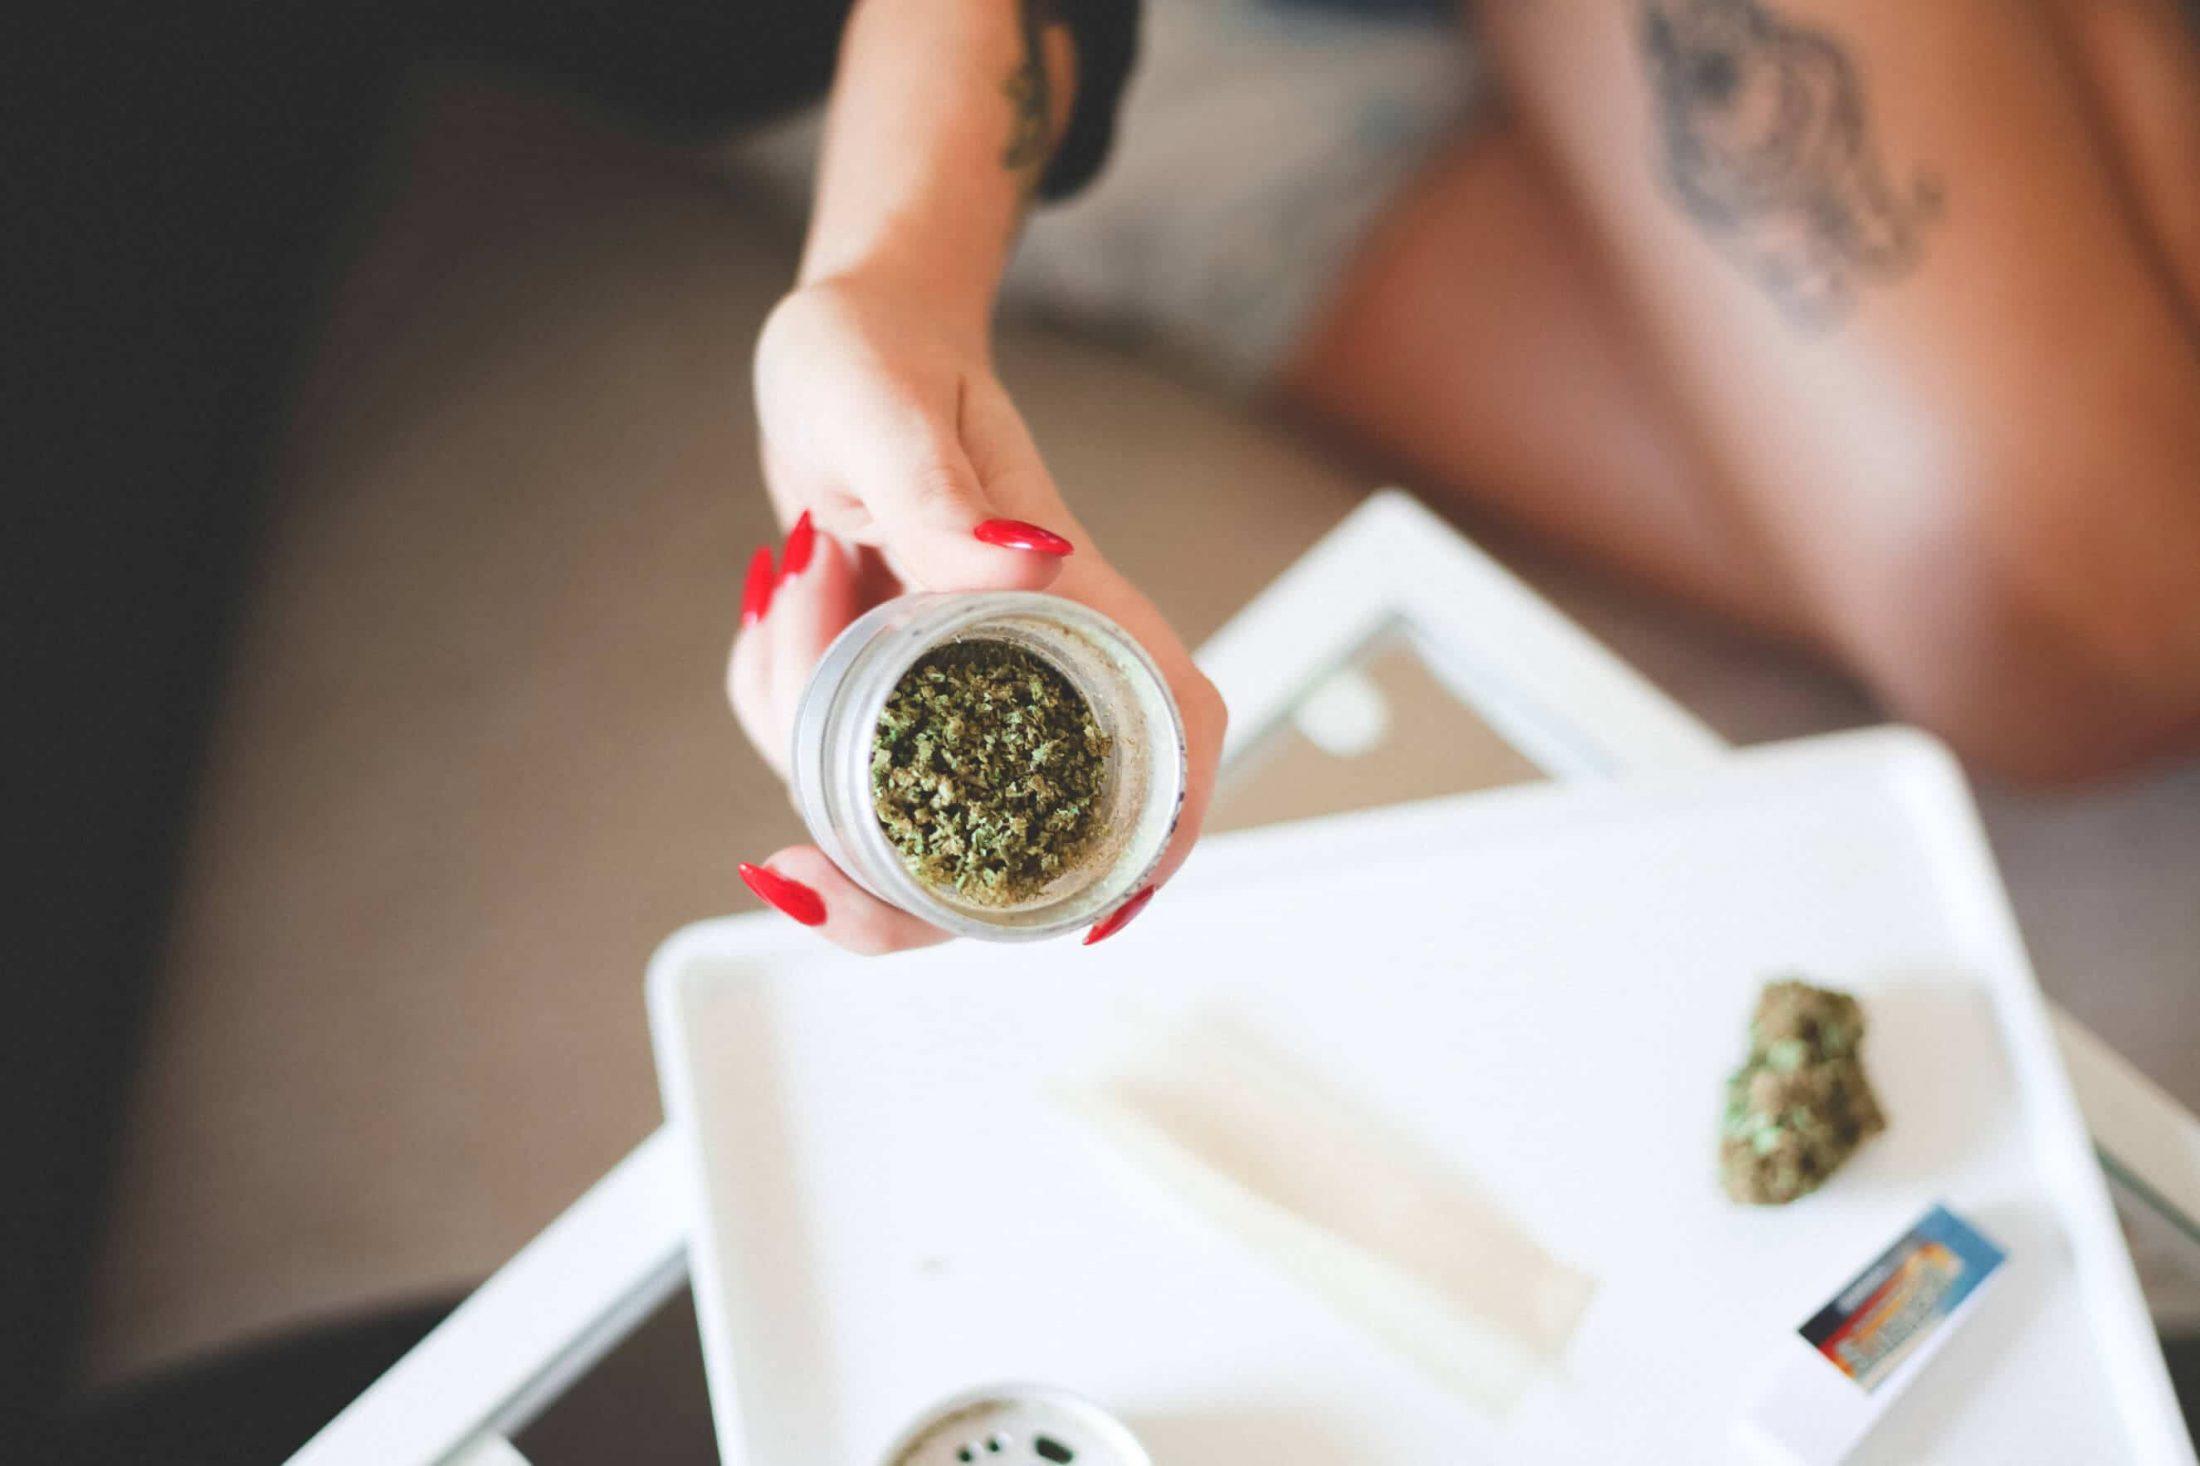 las vegas dispensary guide to marijuana laws in 2018